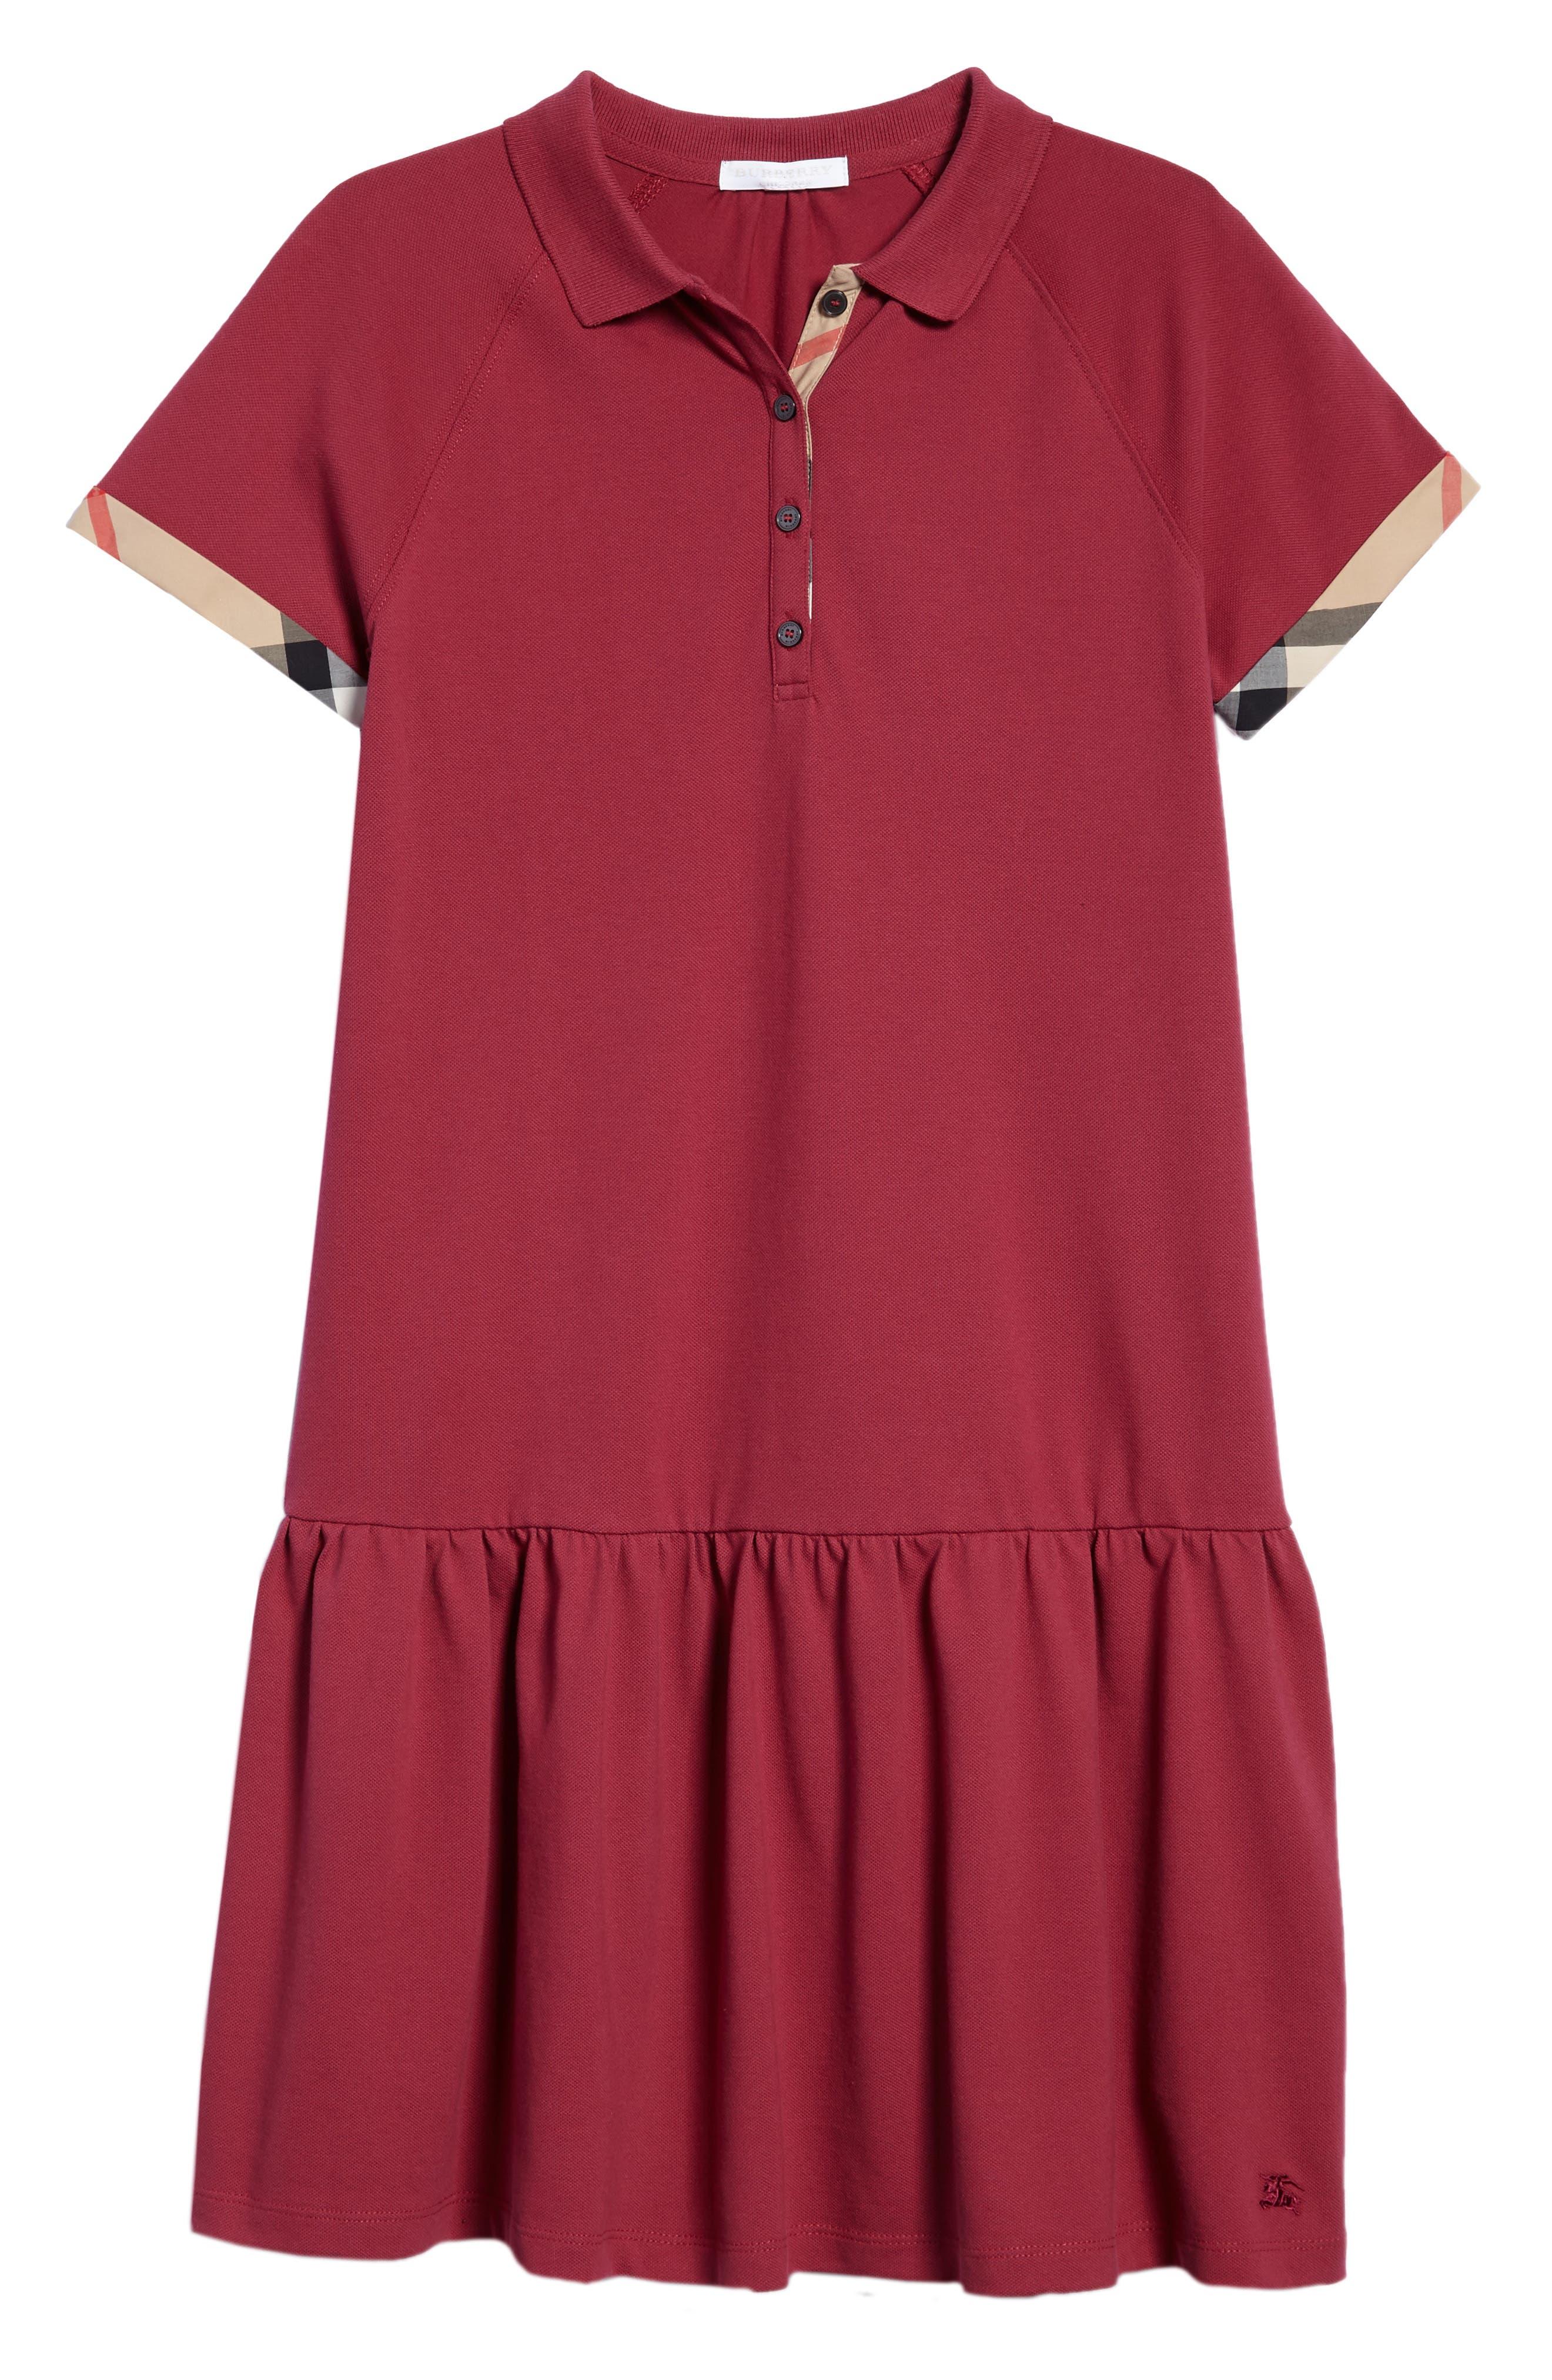 Cali Polo Dress,                         Main,                         color, Garnet Pink